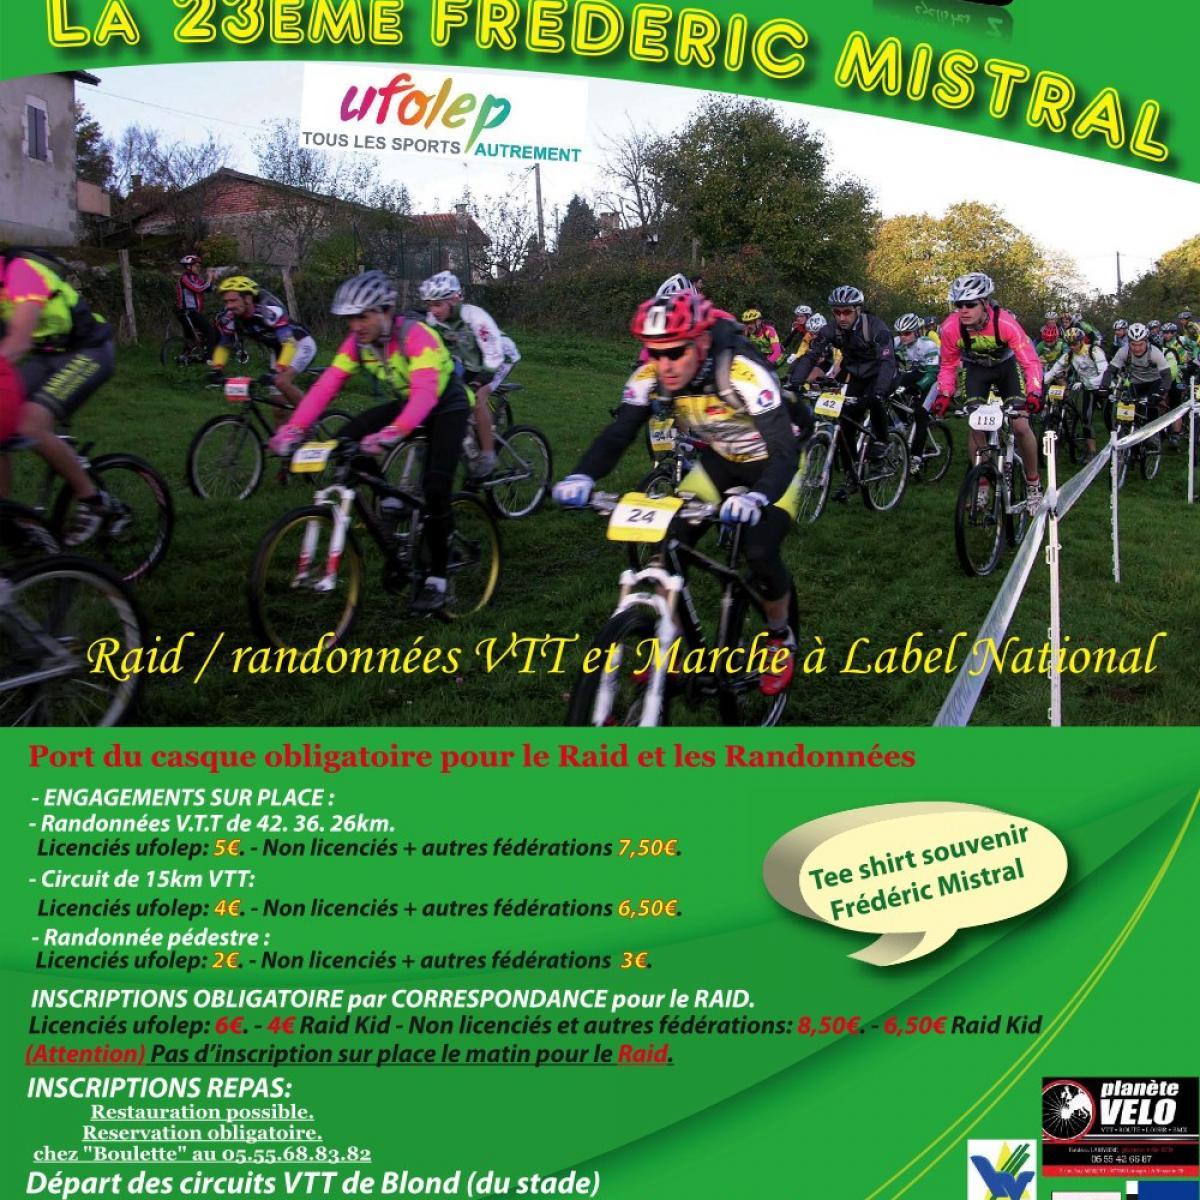 Fredericmistral2014